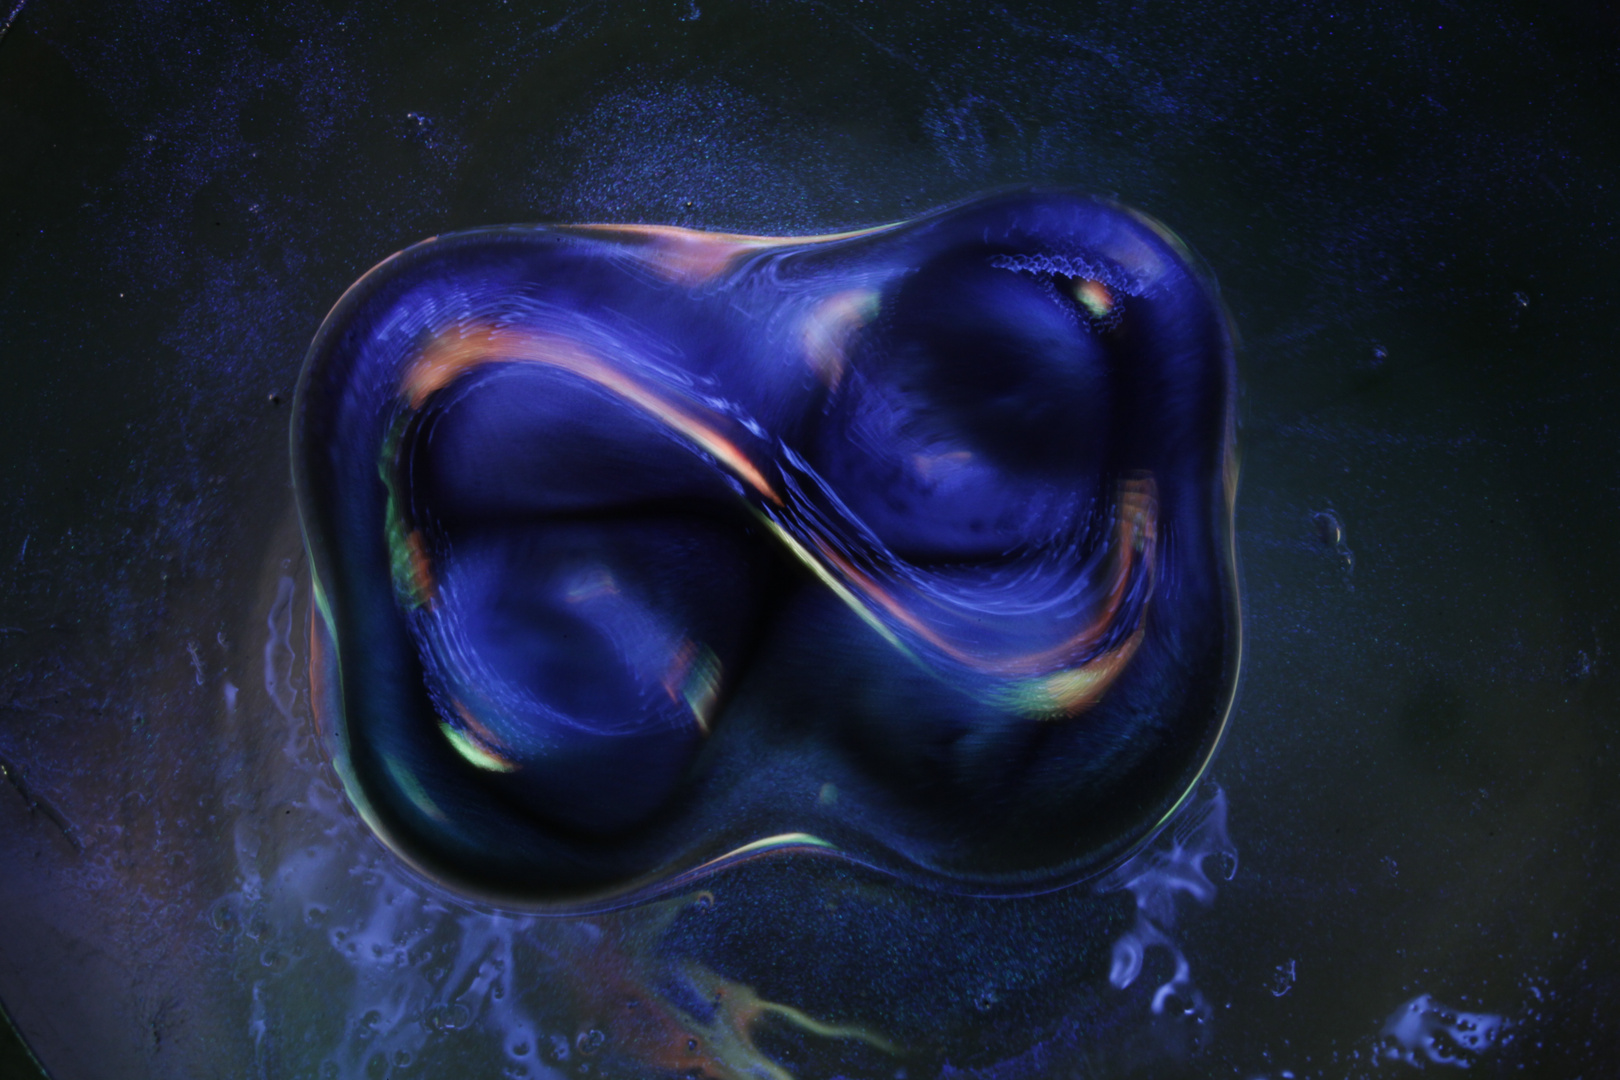 Lemniscate Blue